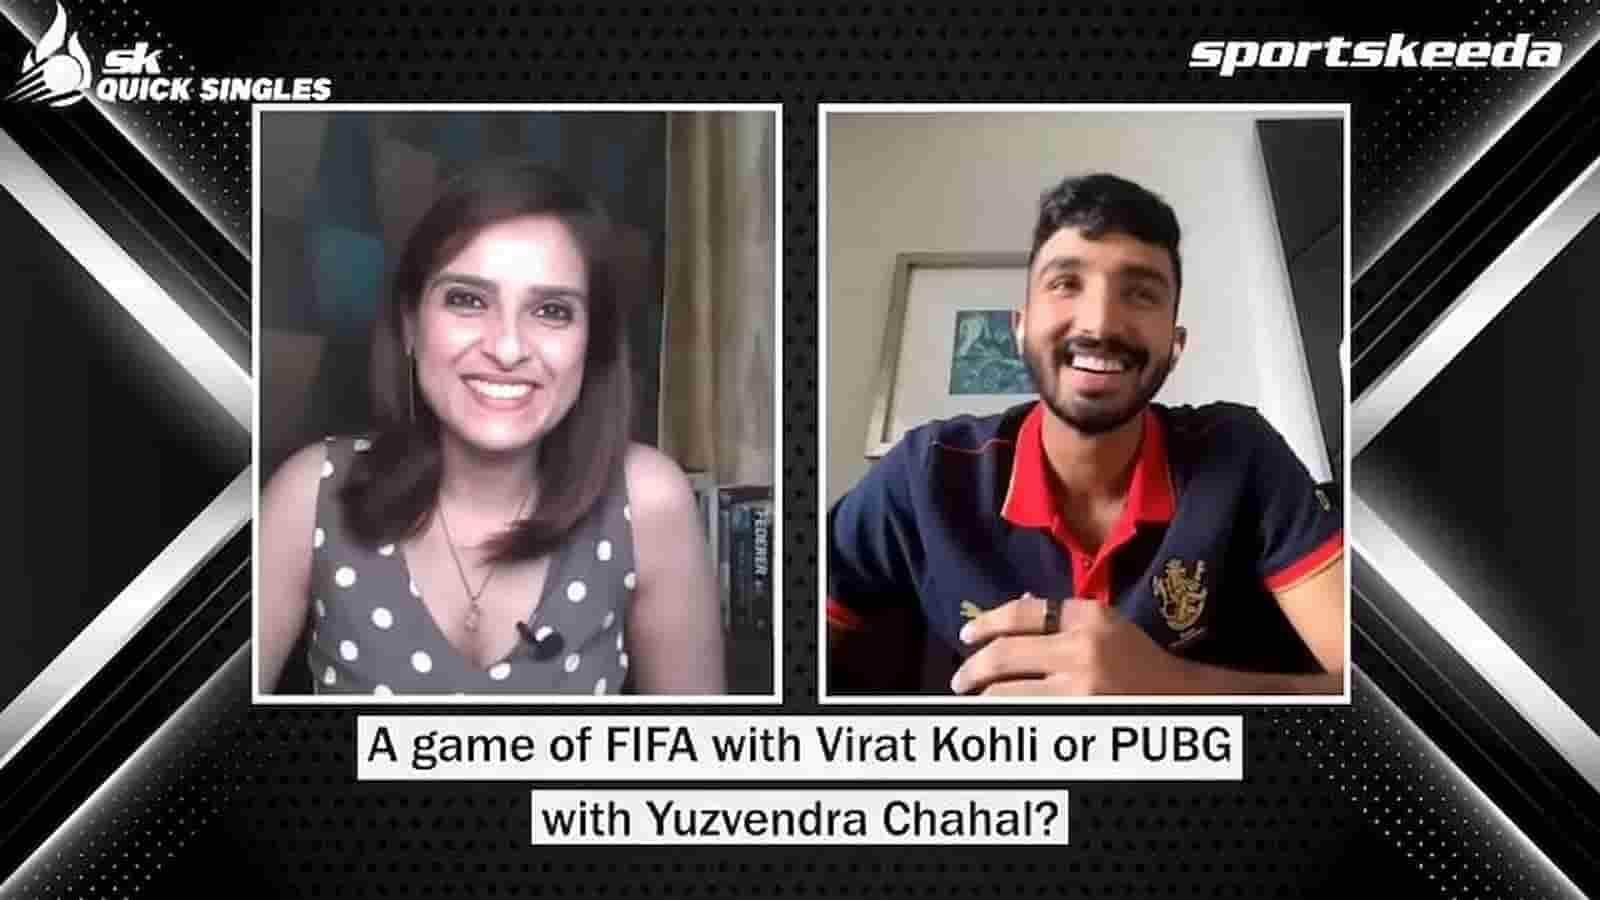 PUBG Mobile with Yuzi Chahal